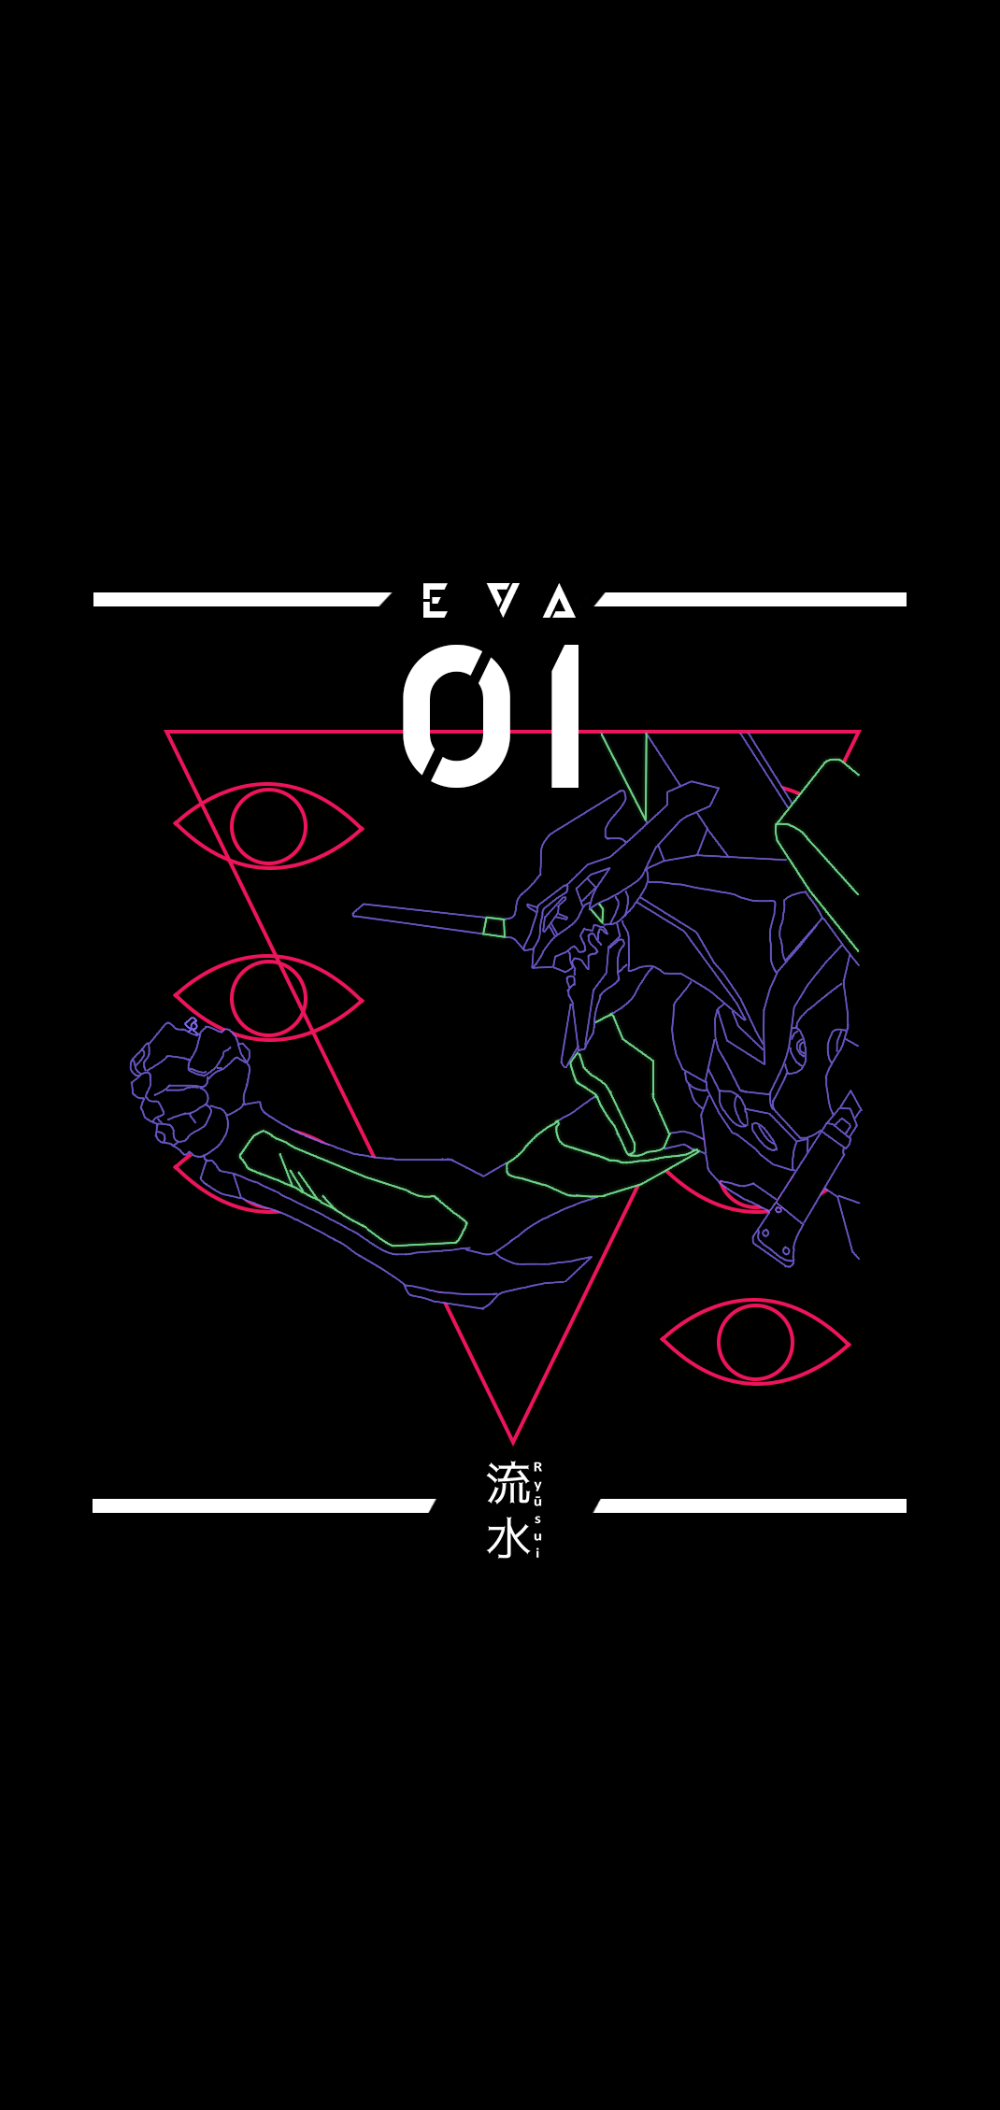 Made A Evangelion Wallpaper Hope You Guys Like It Evangelion Evangelion Neon Evangelion Neon Genesis Evangelion